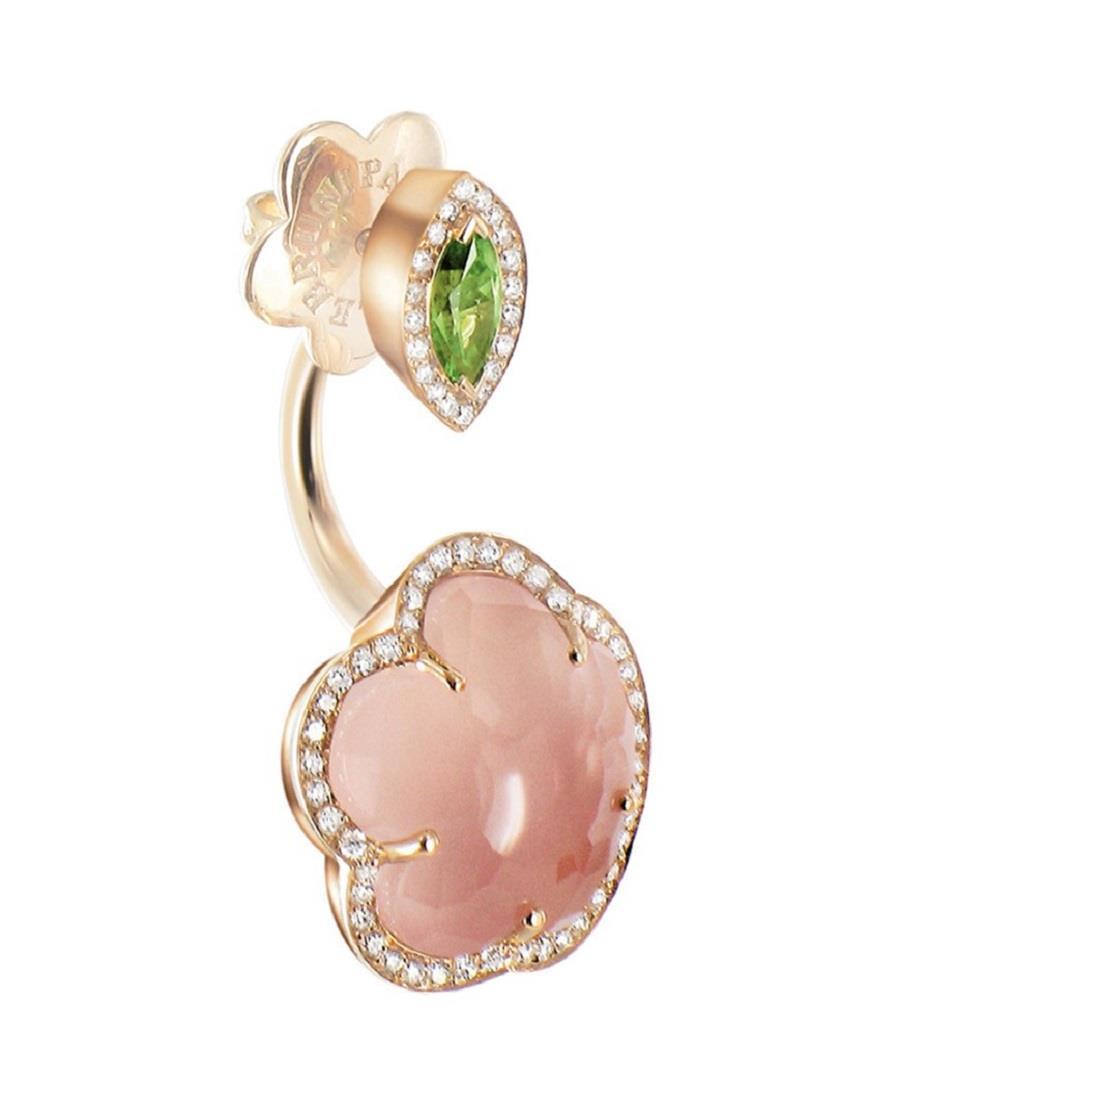 Monoorecchino design con diamanti - PASQUALE BRUNI